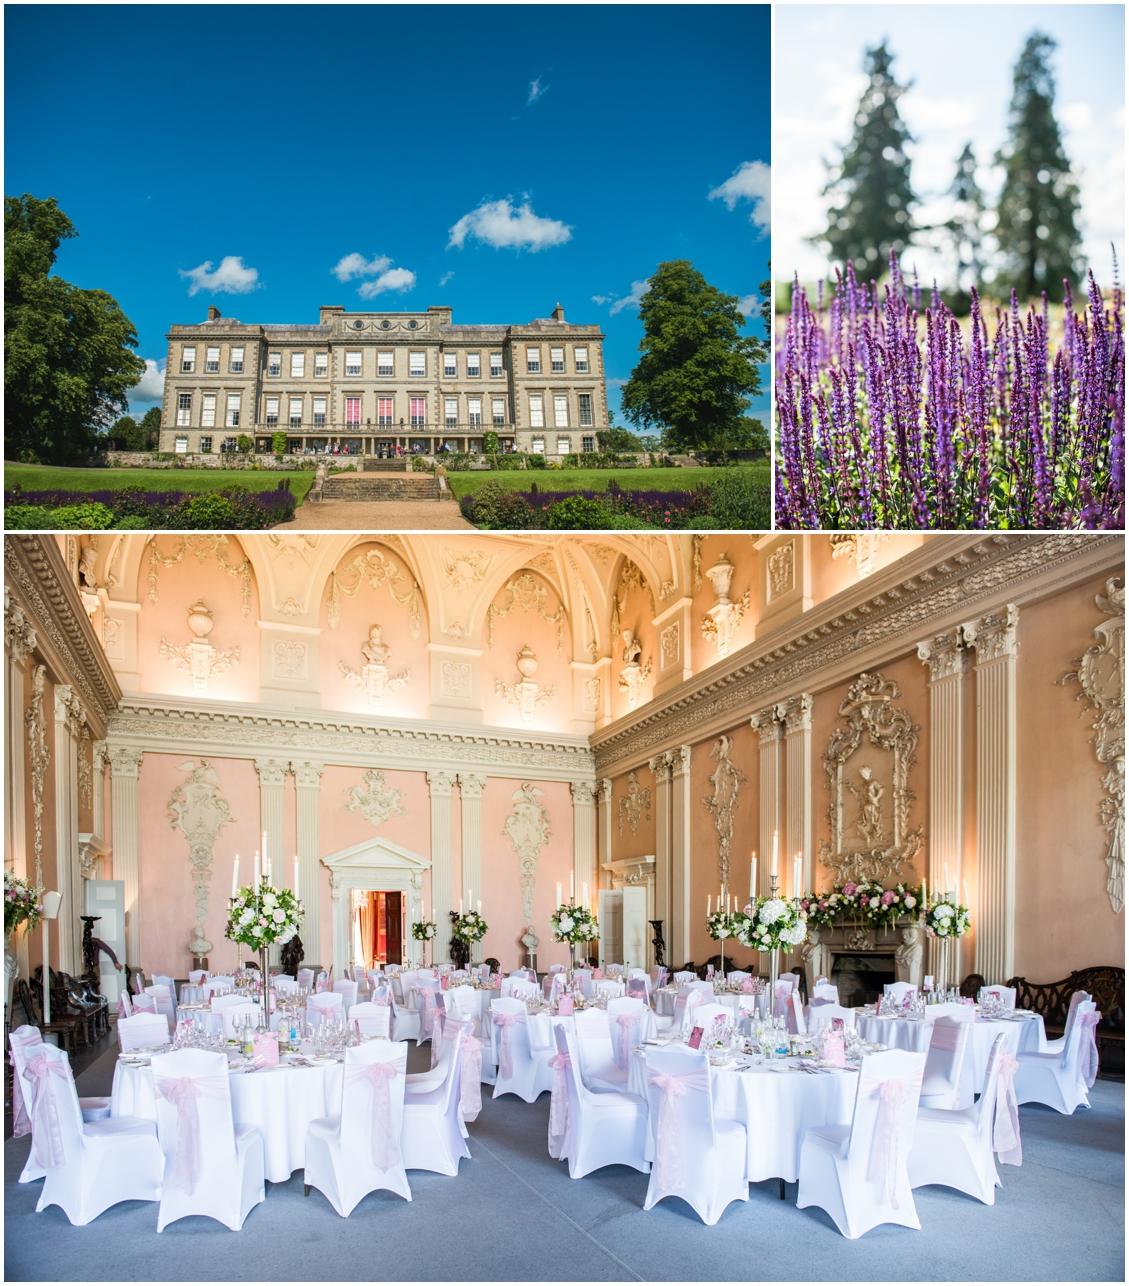 Ragley Hall Residence Modern Dwellings Cablik Enterprises: Sophie And Aled – Ragley Hall Wedding Photography